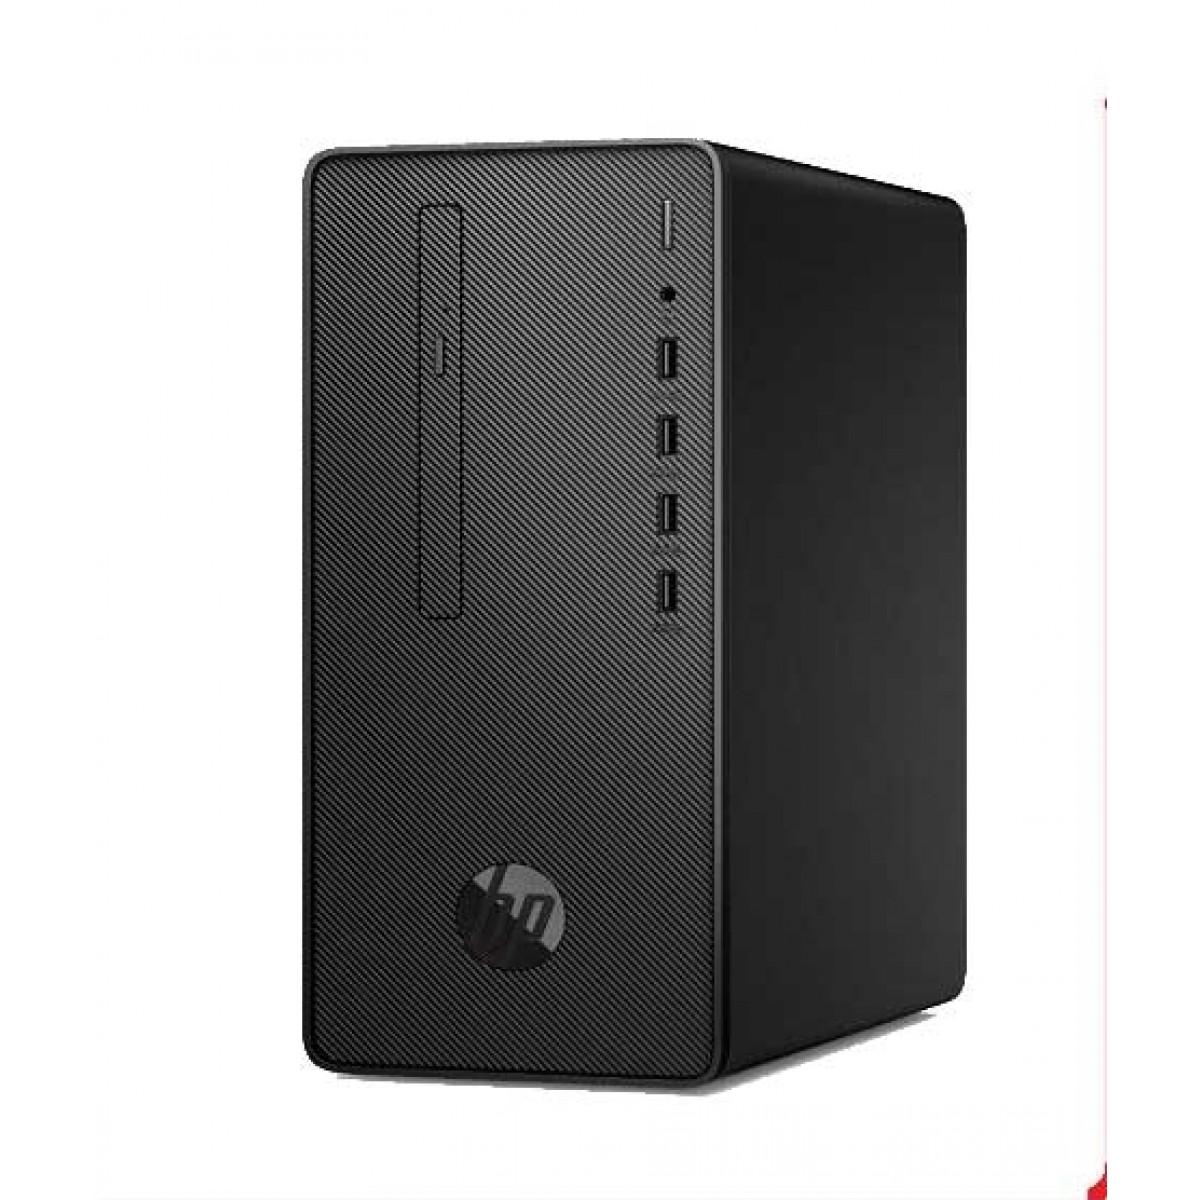 HP ProDesk Pro G3 PC (7WP25AV) Price in Pakistan | Buy HP ProDesk Pro G3  Core i3 9th Generation Micro Tower PC (7WP25AV) | iShopping.pk